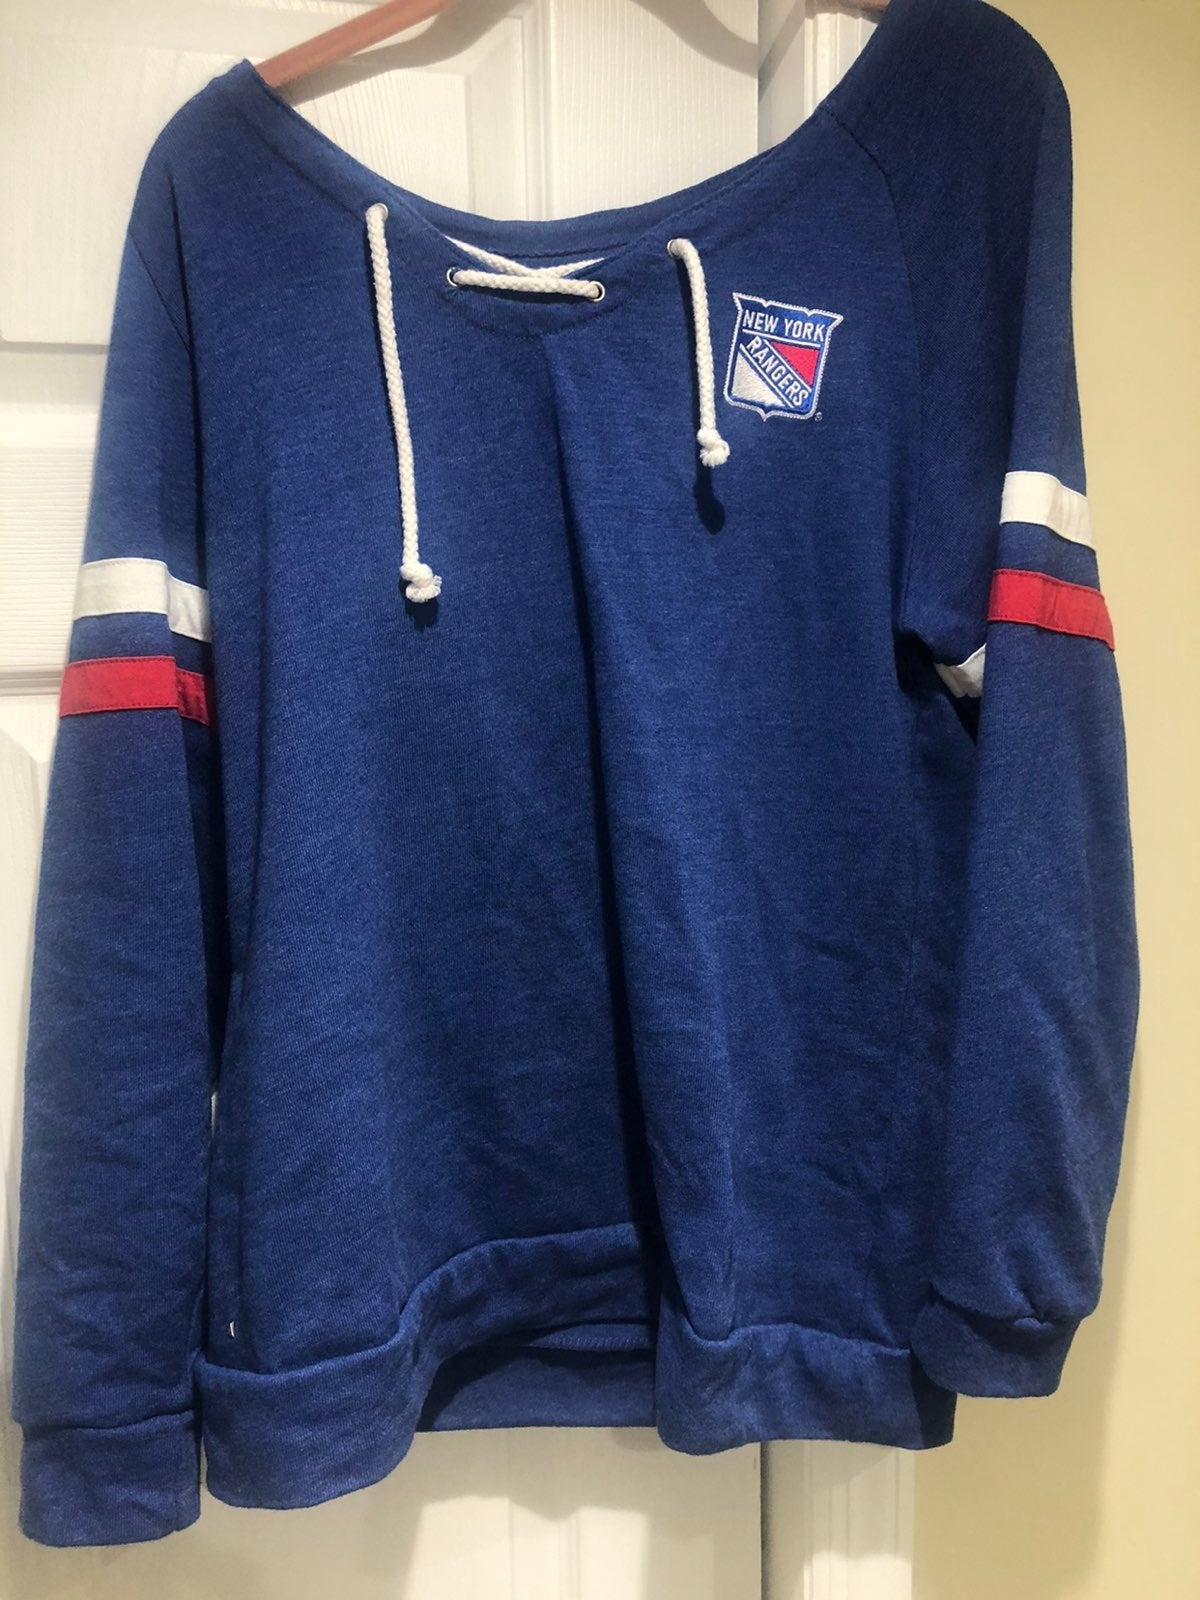 Rangers Sweatshirt